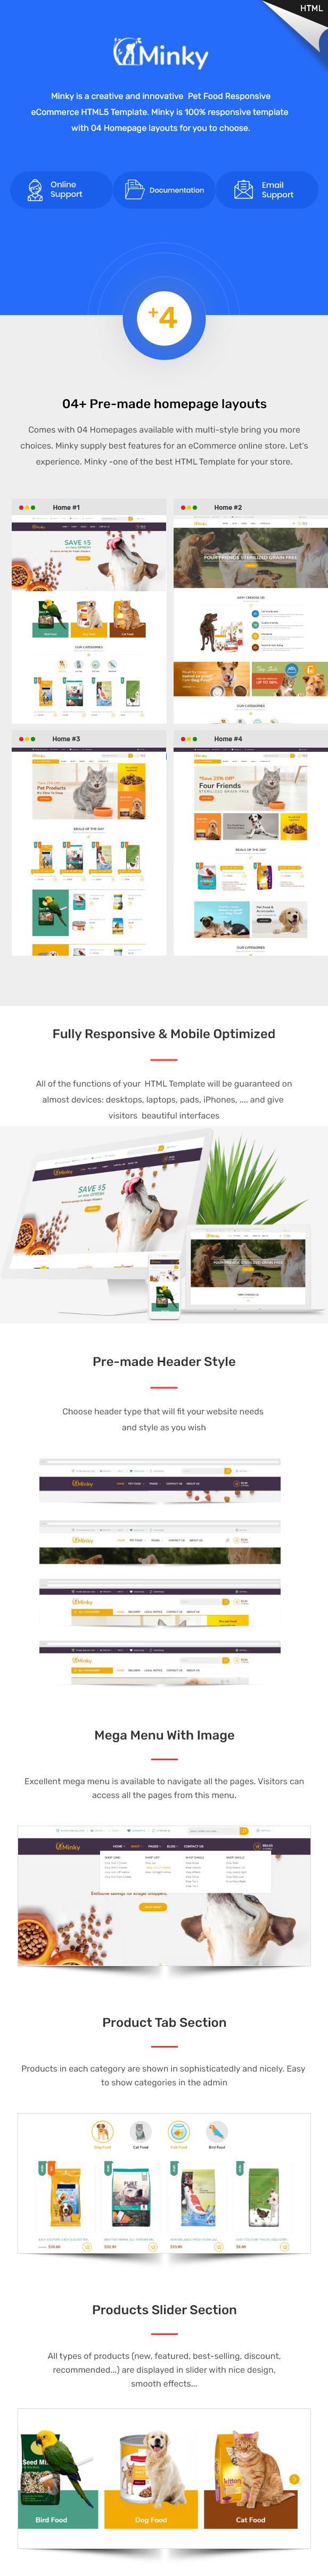 Minky – Pet Food Responsive eCommerce HTML5 Template - 1